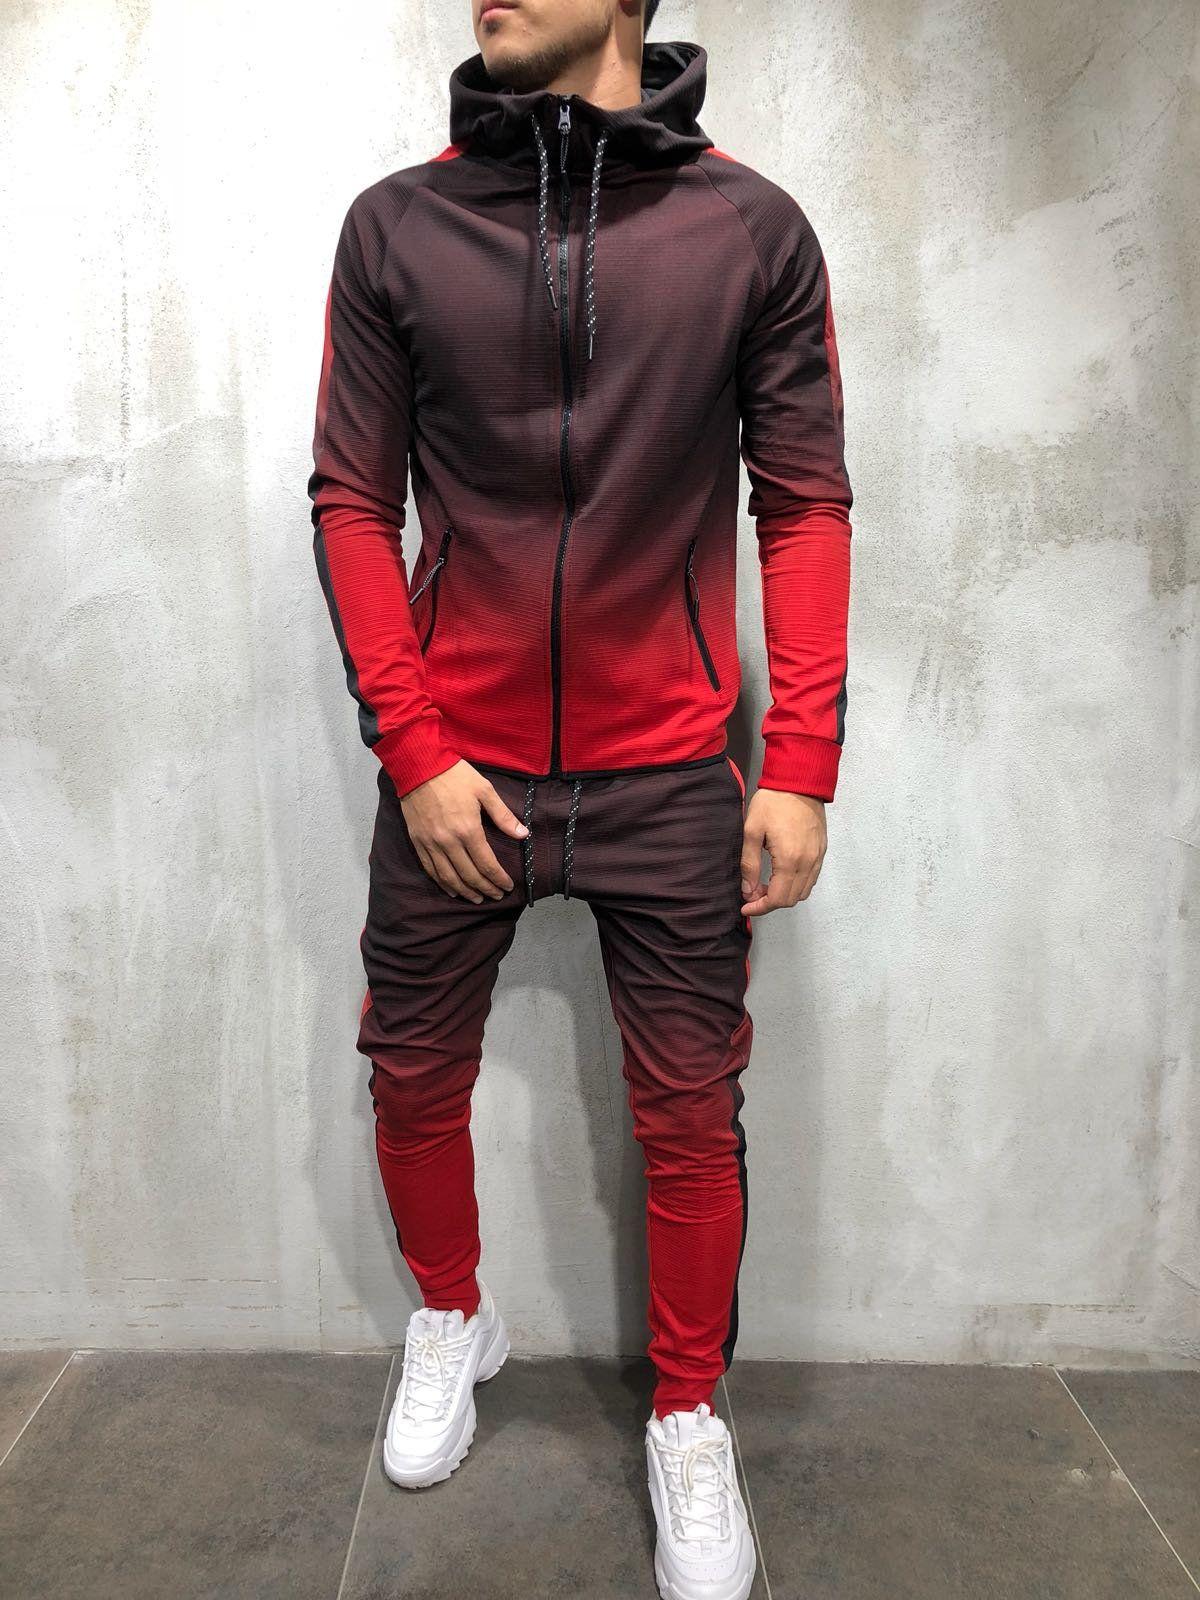 049773da0 Men Tone Dye Fade Track Suit Sweatpant Hoodie Sweater - Red 3957 ...